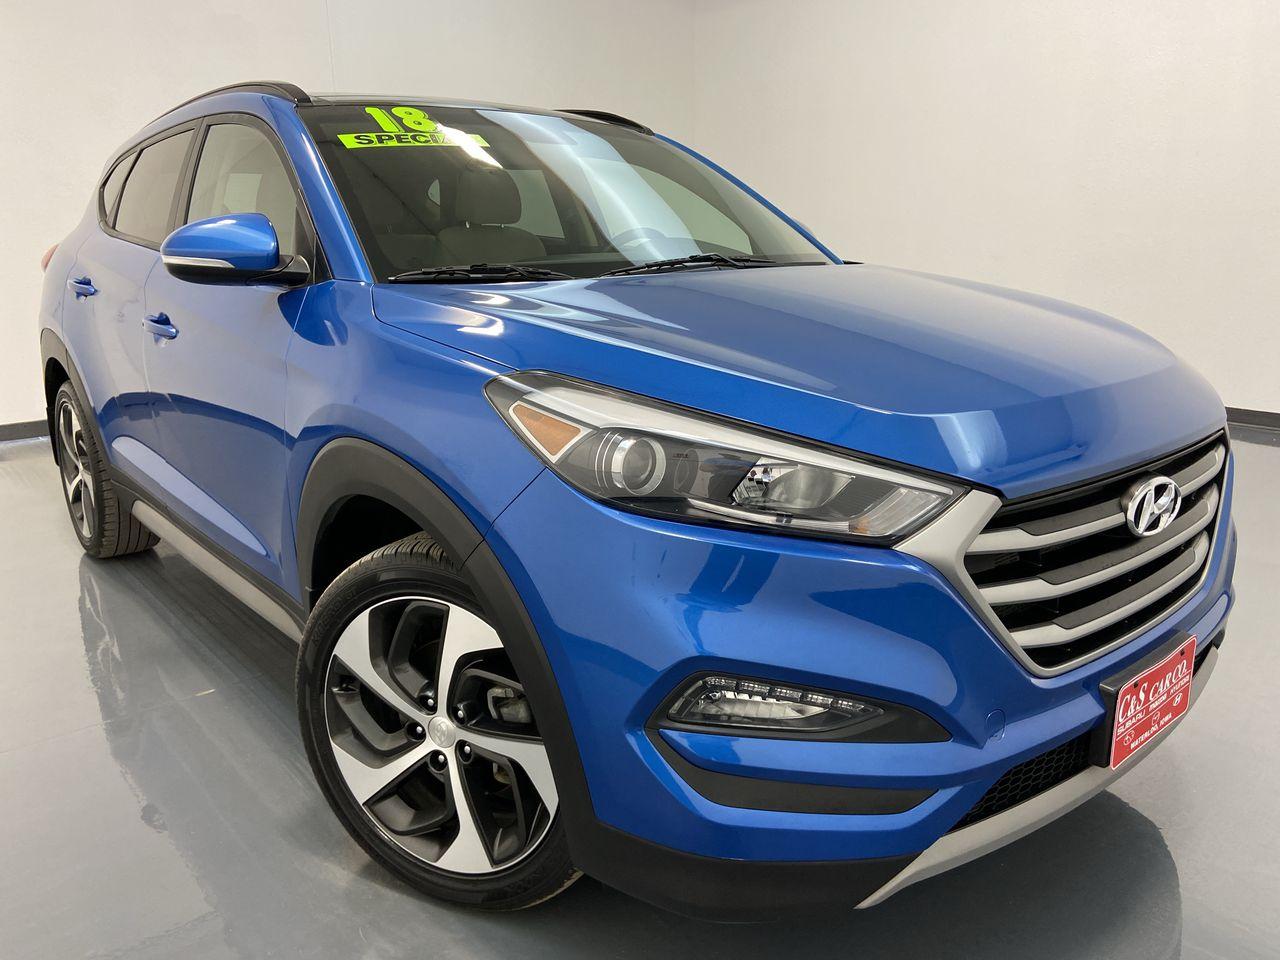 2018 Hyundai Tucson 4D SUV AWD  - HY8401A  - C & S Car Company